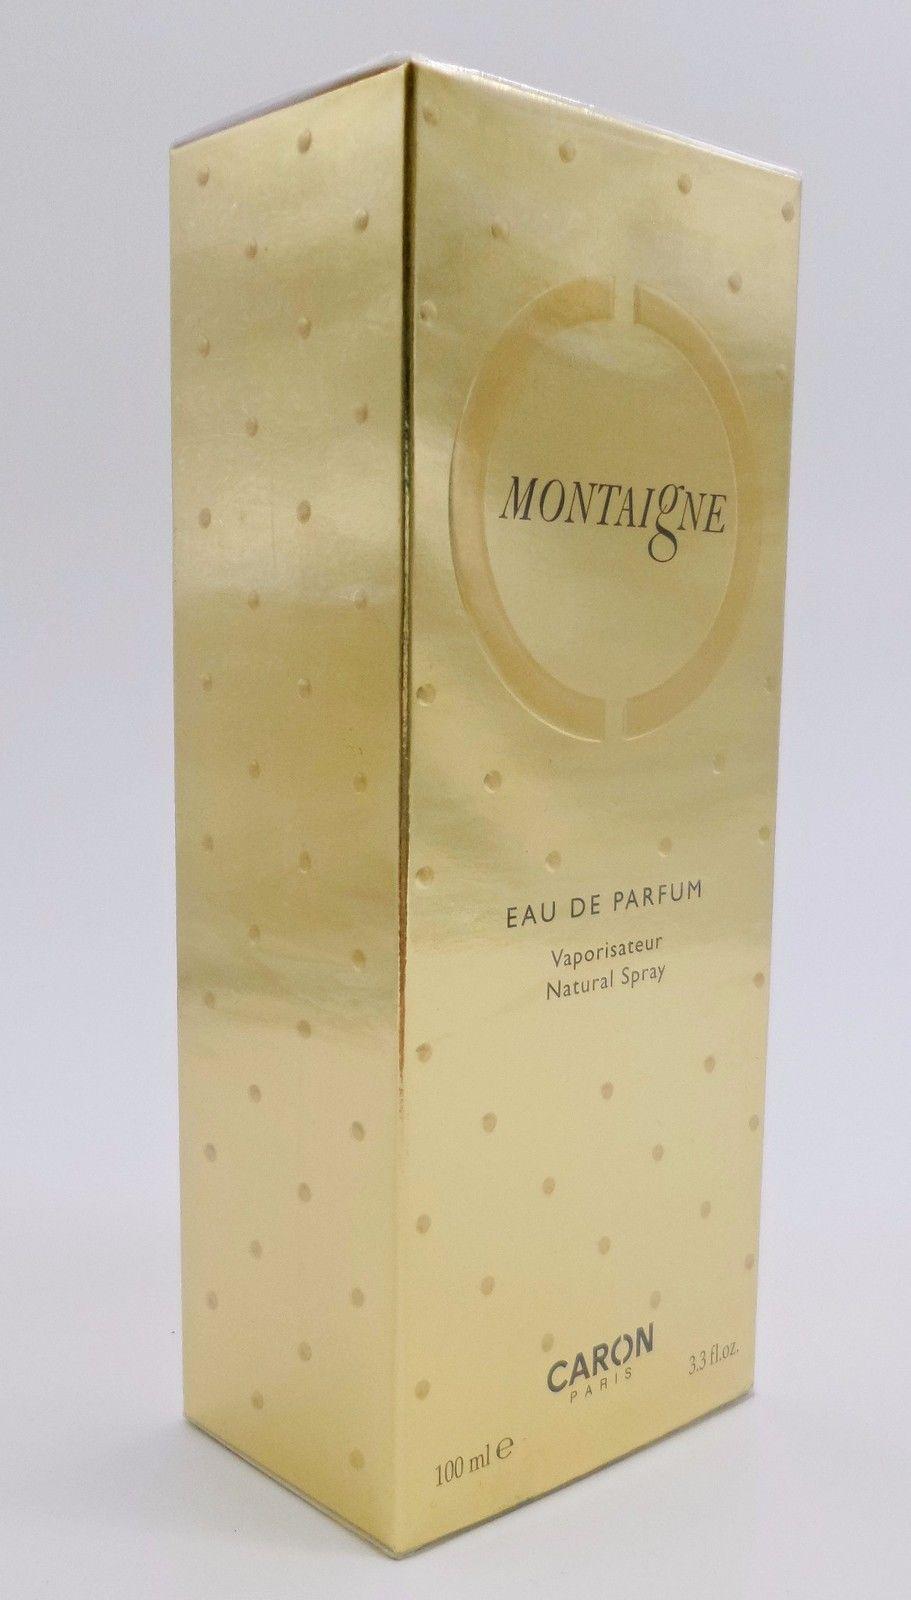 MONTAIGNE BY CARON 3.3 OZ/ 100 ML EAU DE PARFUM SPRAY FOR WOMEN - $165.00